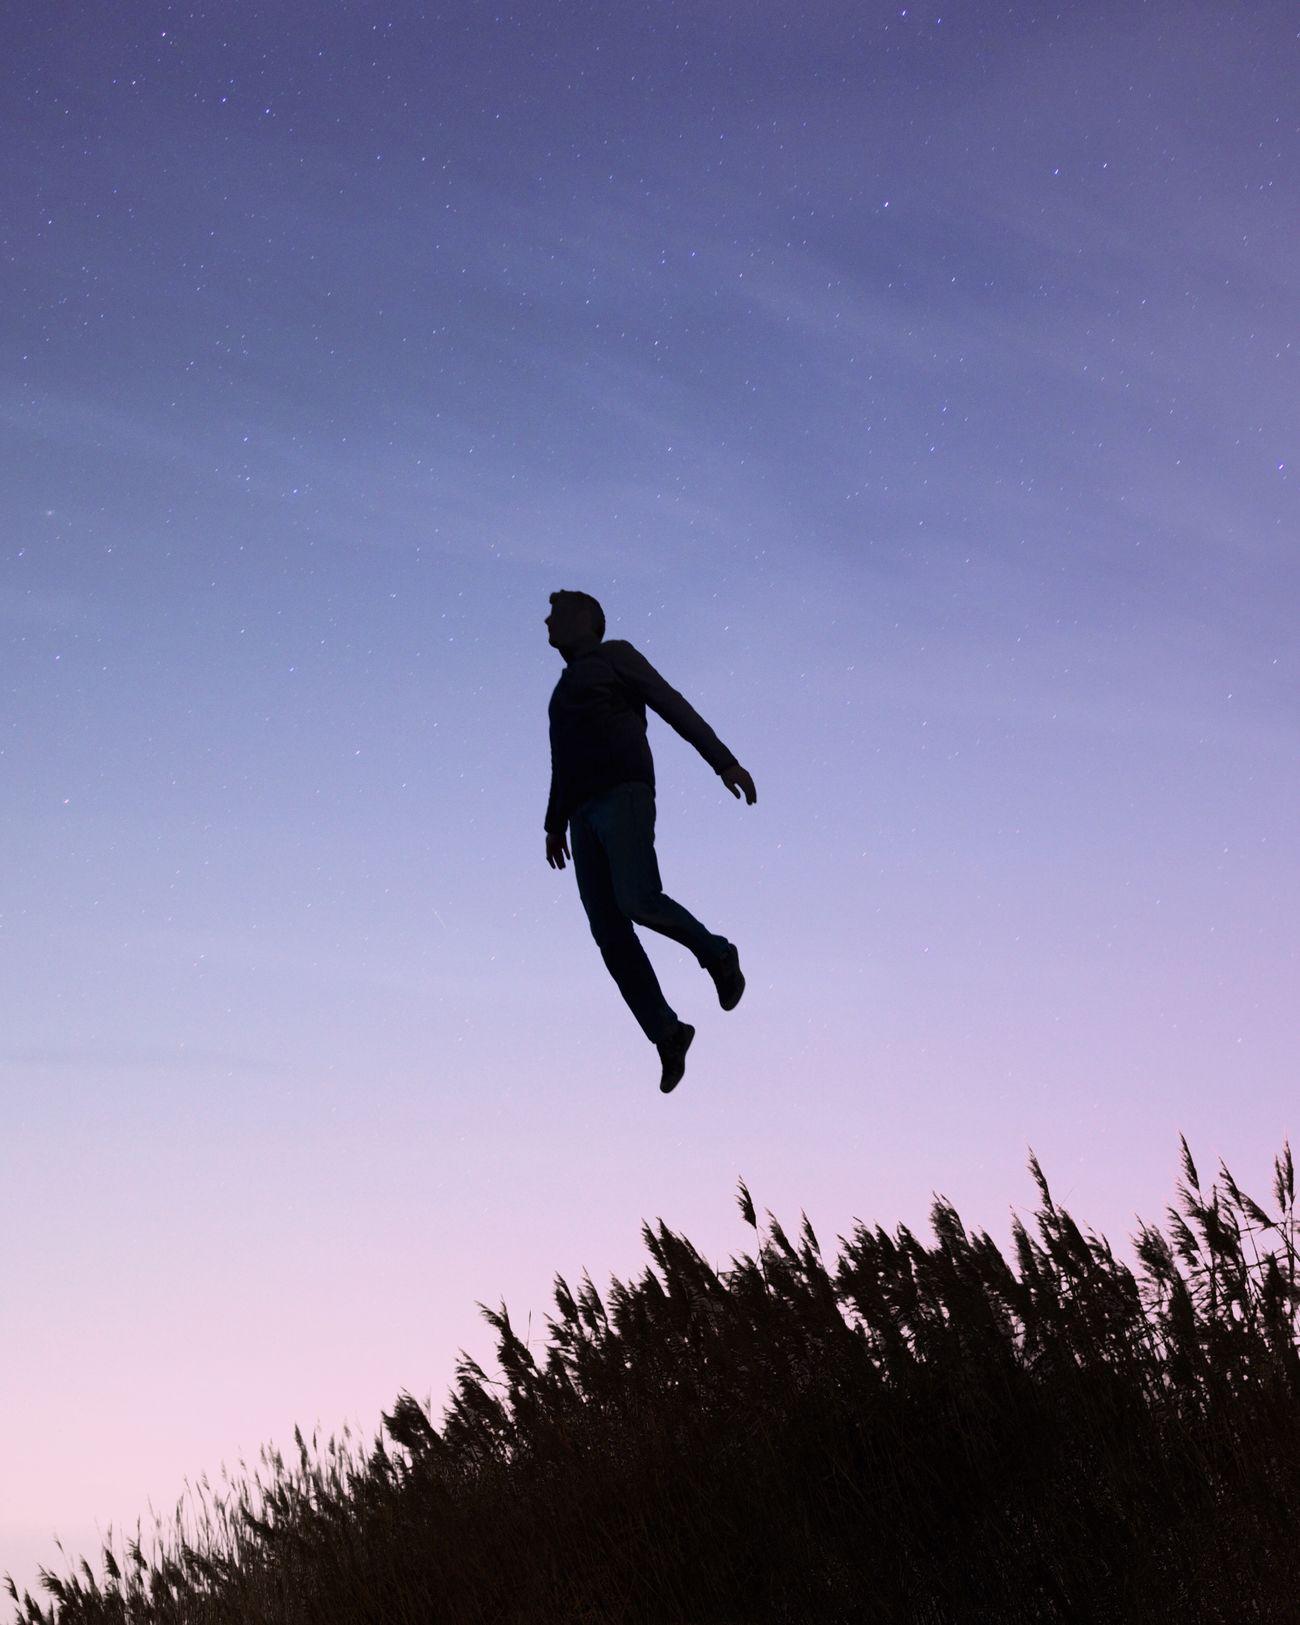 Sky Nature Outdoors Night Jump Take Off Reeds Dune Du Pyla Bassin D'Arcachon Rêverie Dream Dreaming Stars & Dreams Stars EyeEm Best Edits EyeEm Best Shots EyeEmBestPics TheWeekOnEyeEM Silhouette Escaping Dusk Night Photography Nightphotography